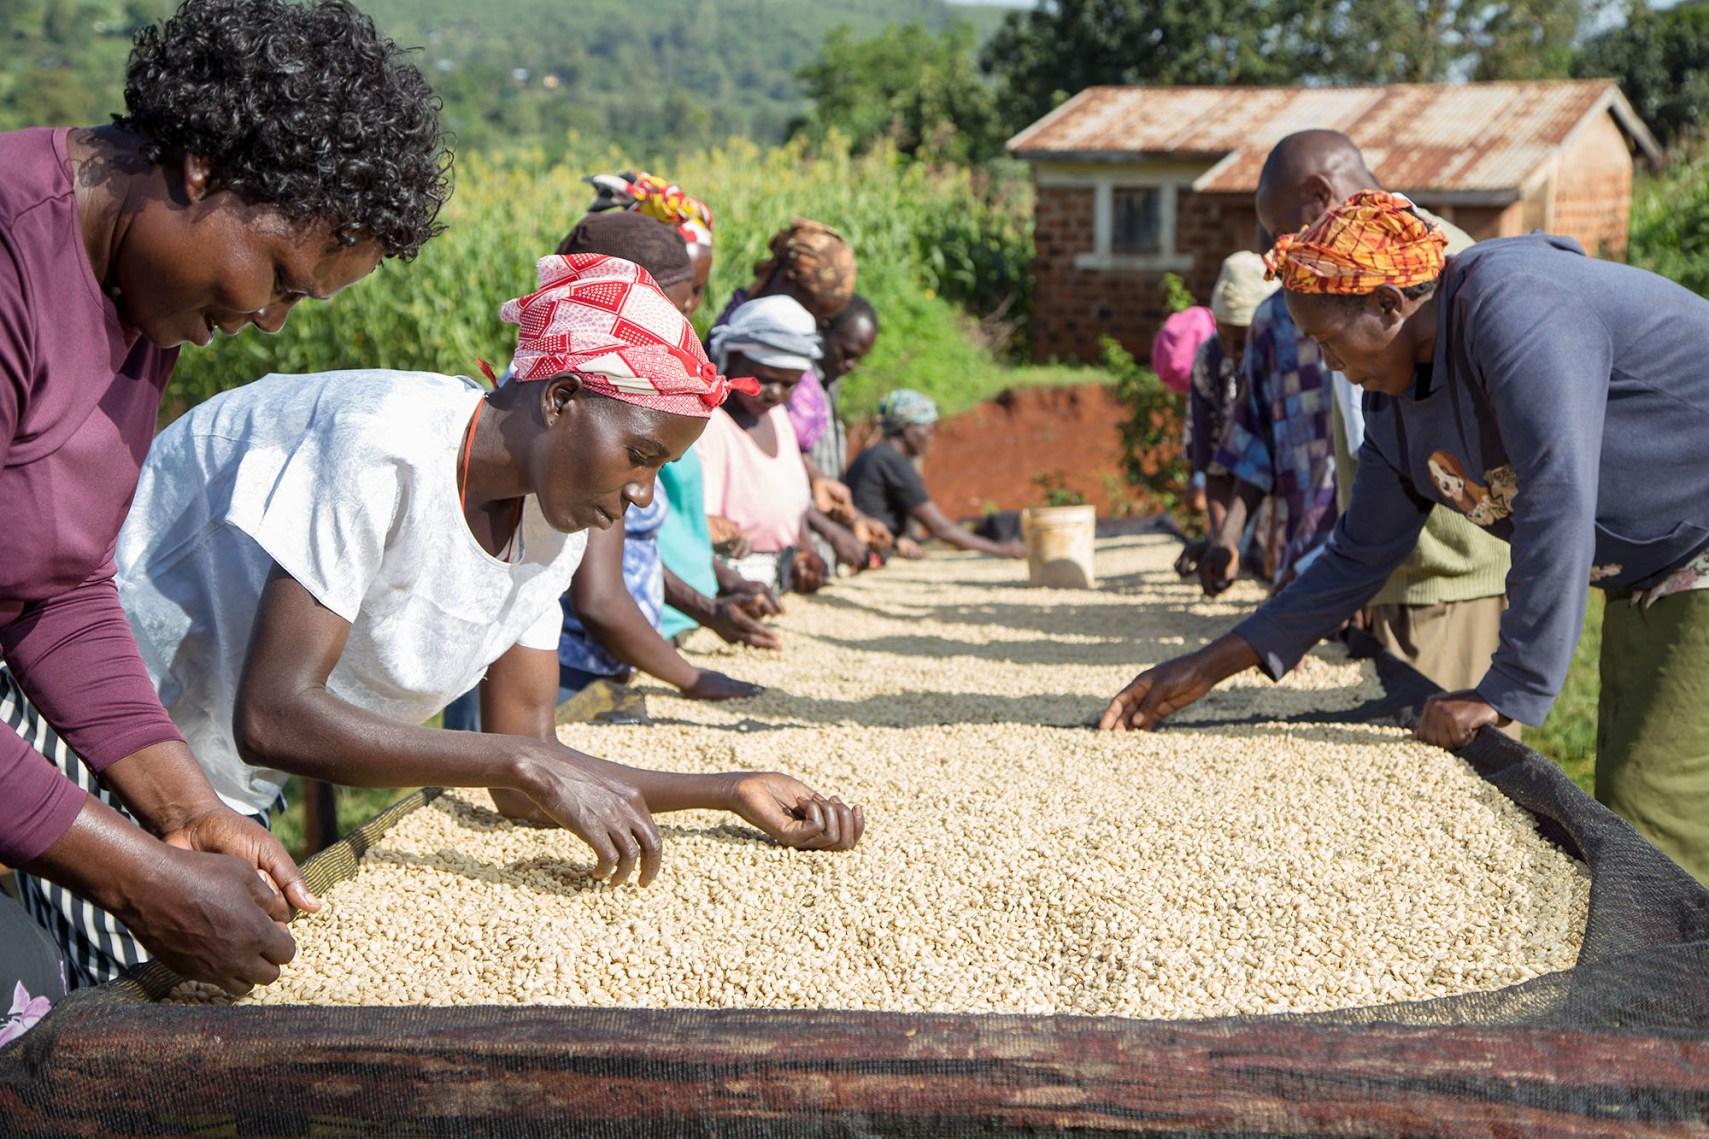 Cooperative members quality-sort coffee in Rachuonyo South, Kenya.